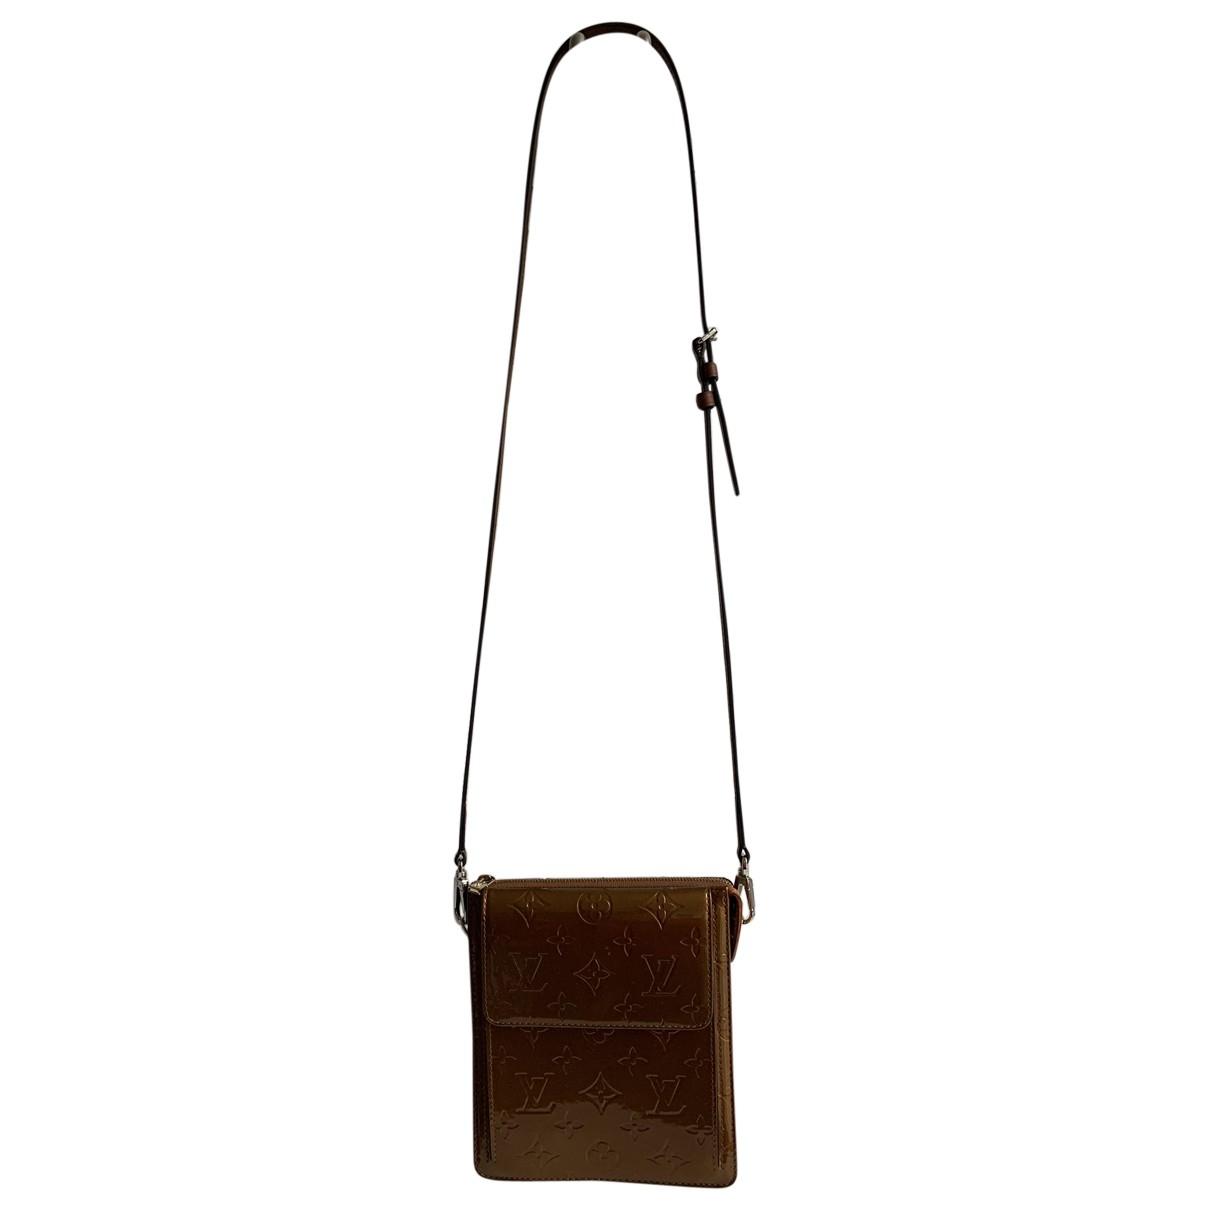 Louis Vuitton \N Brown Patent leather handbag for Women \N